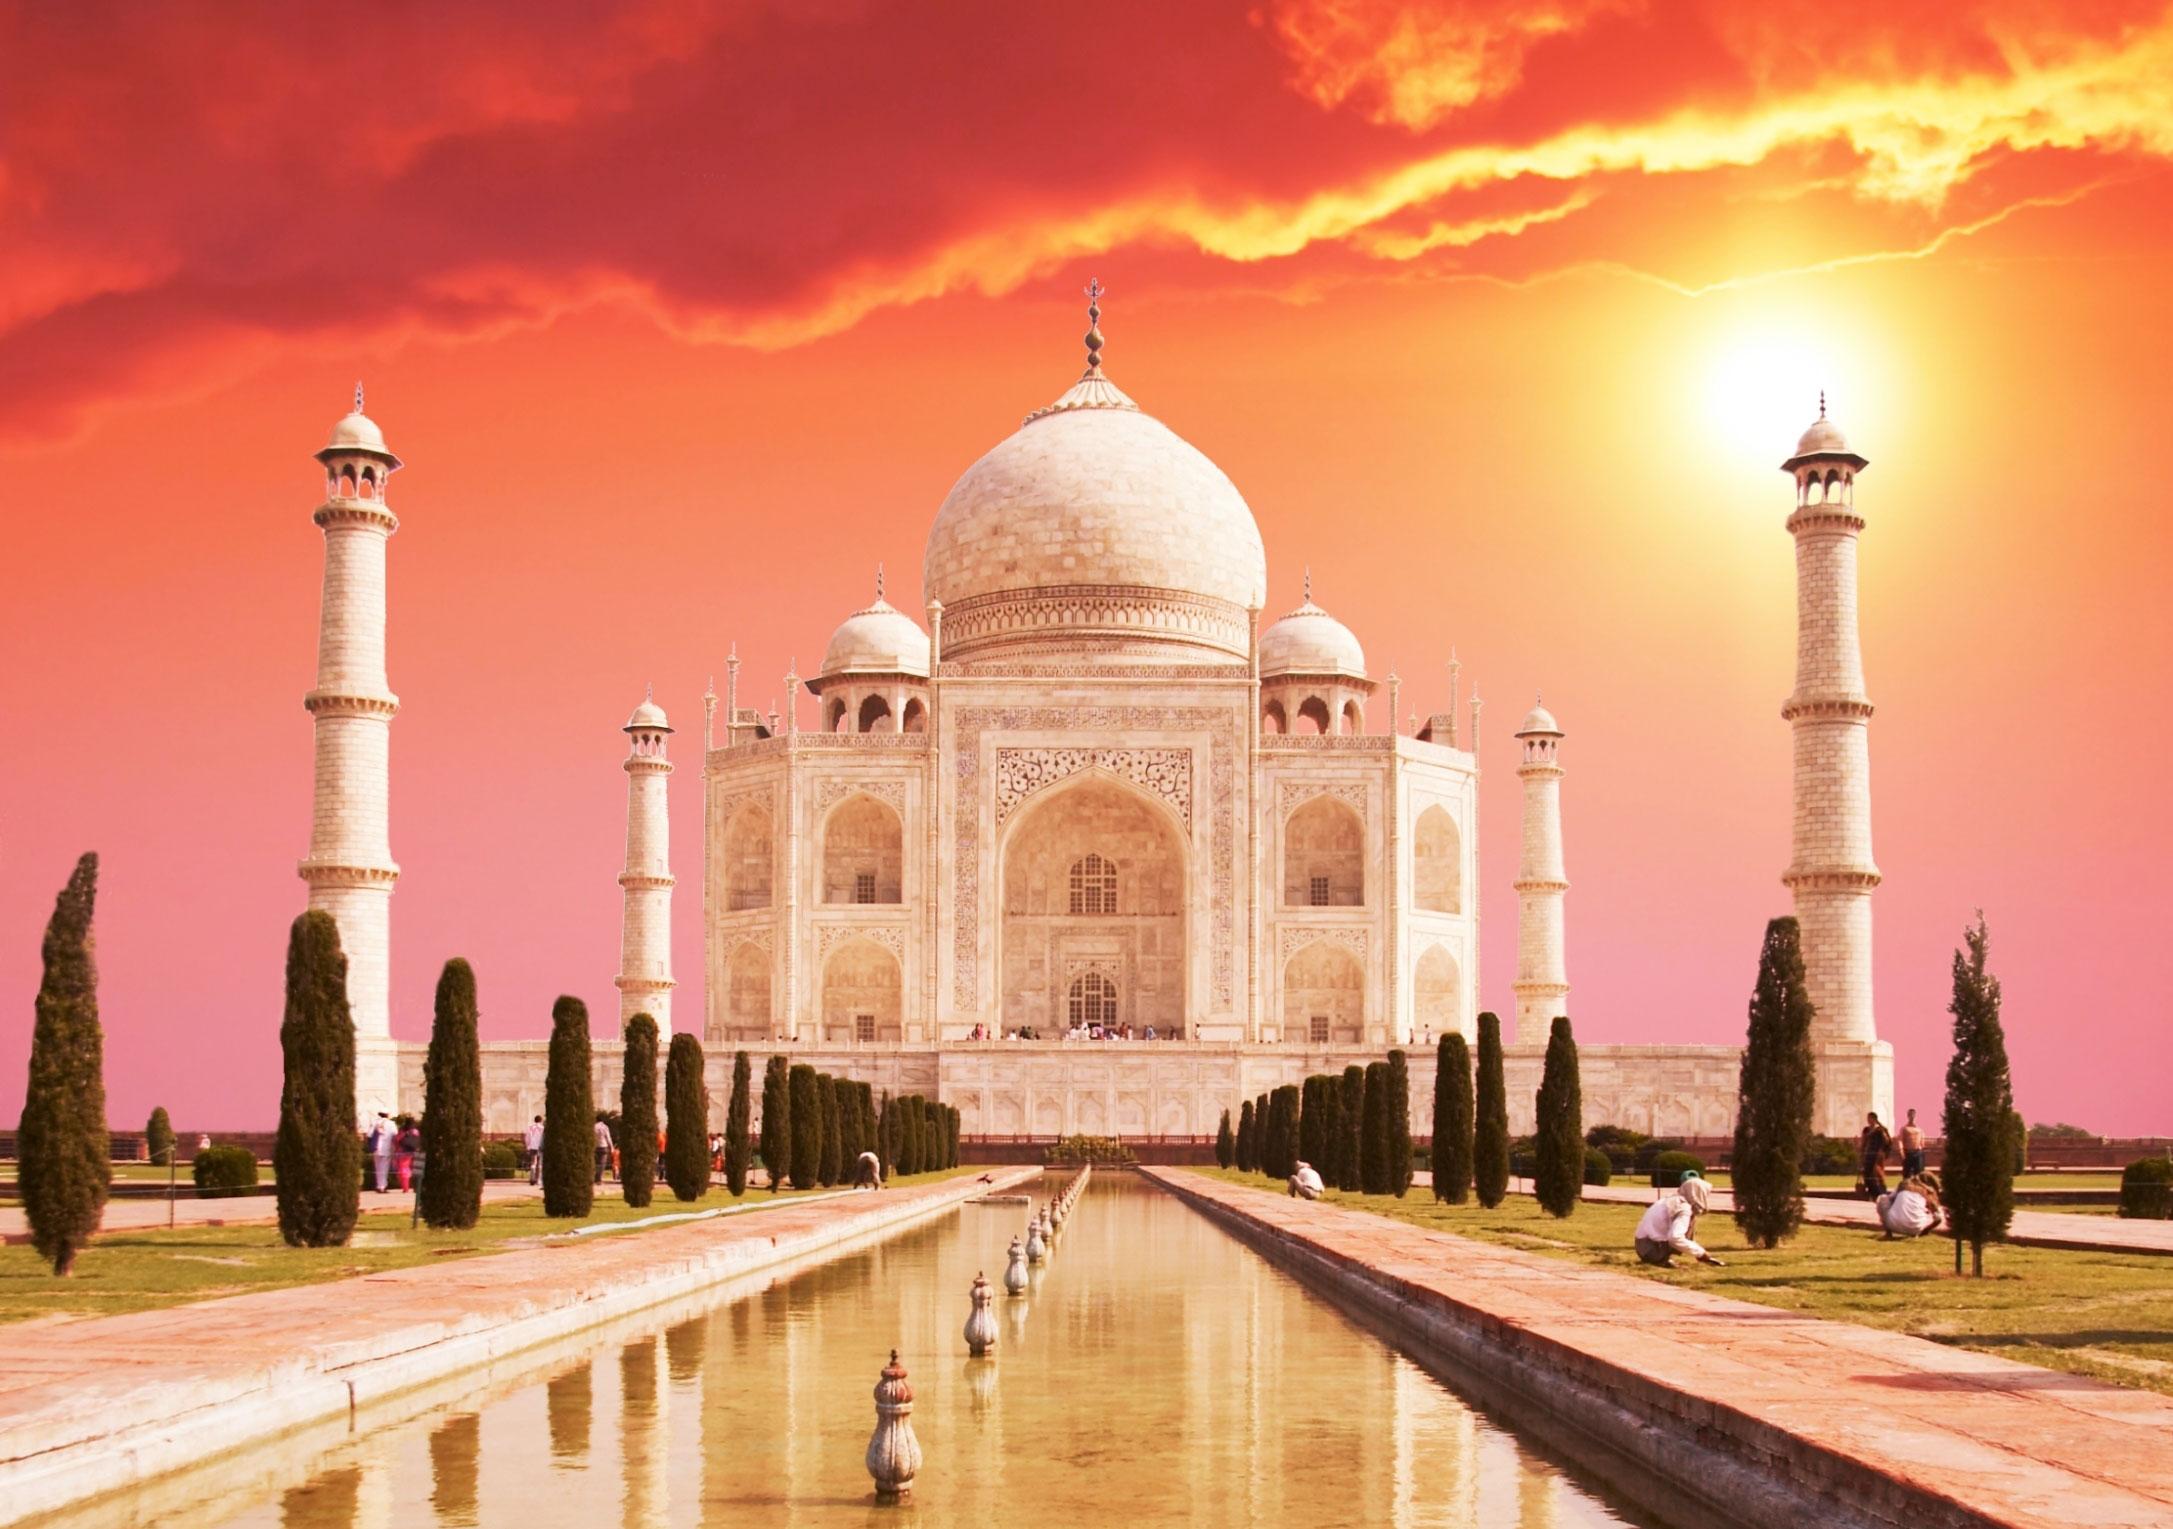 Taj-Mahal sunset quotes